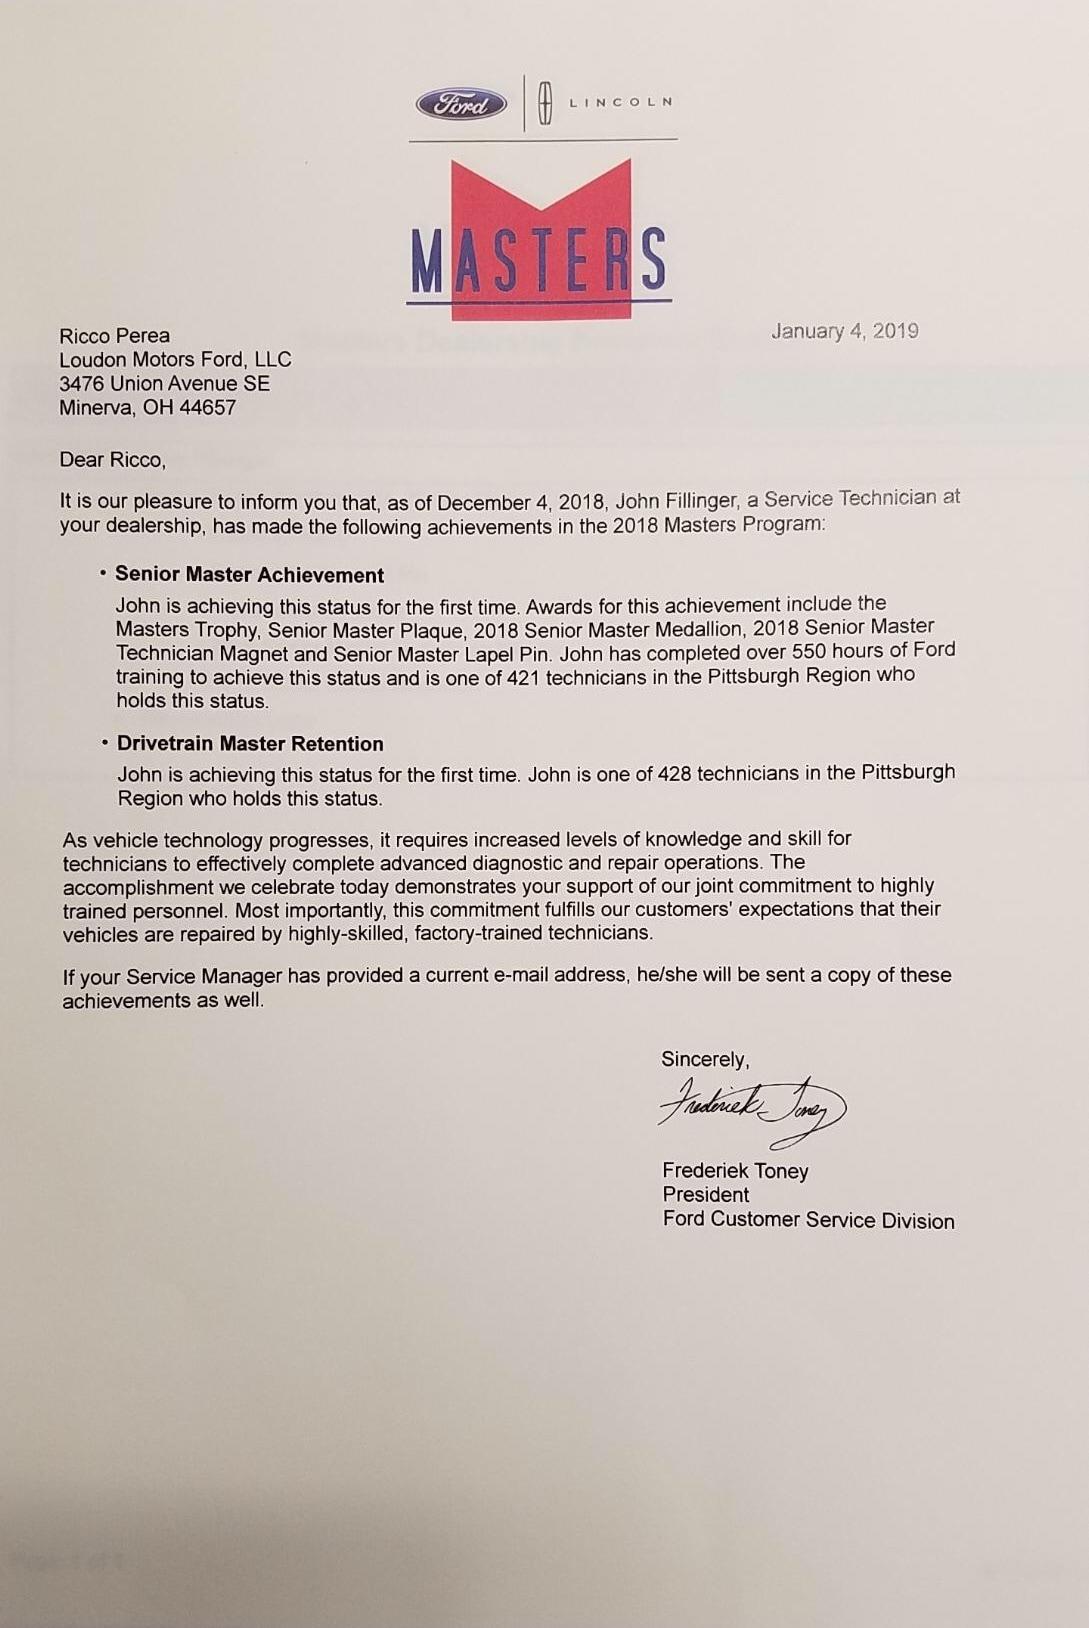 Congratulations to John Fillinger!   Loudon Motors Ford LLC